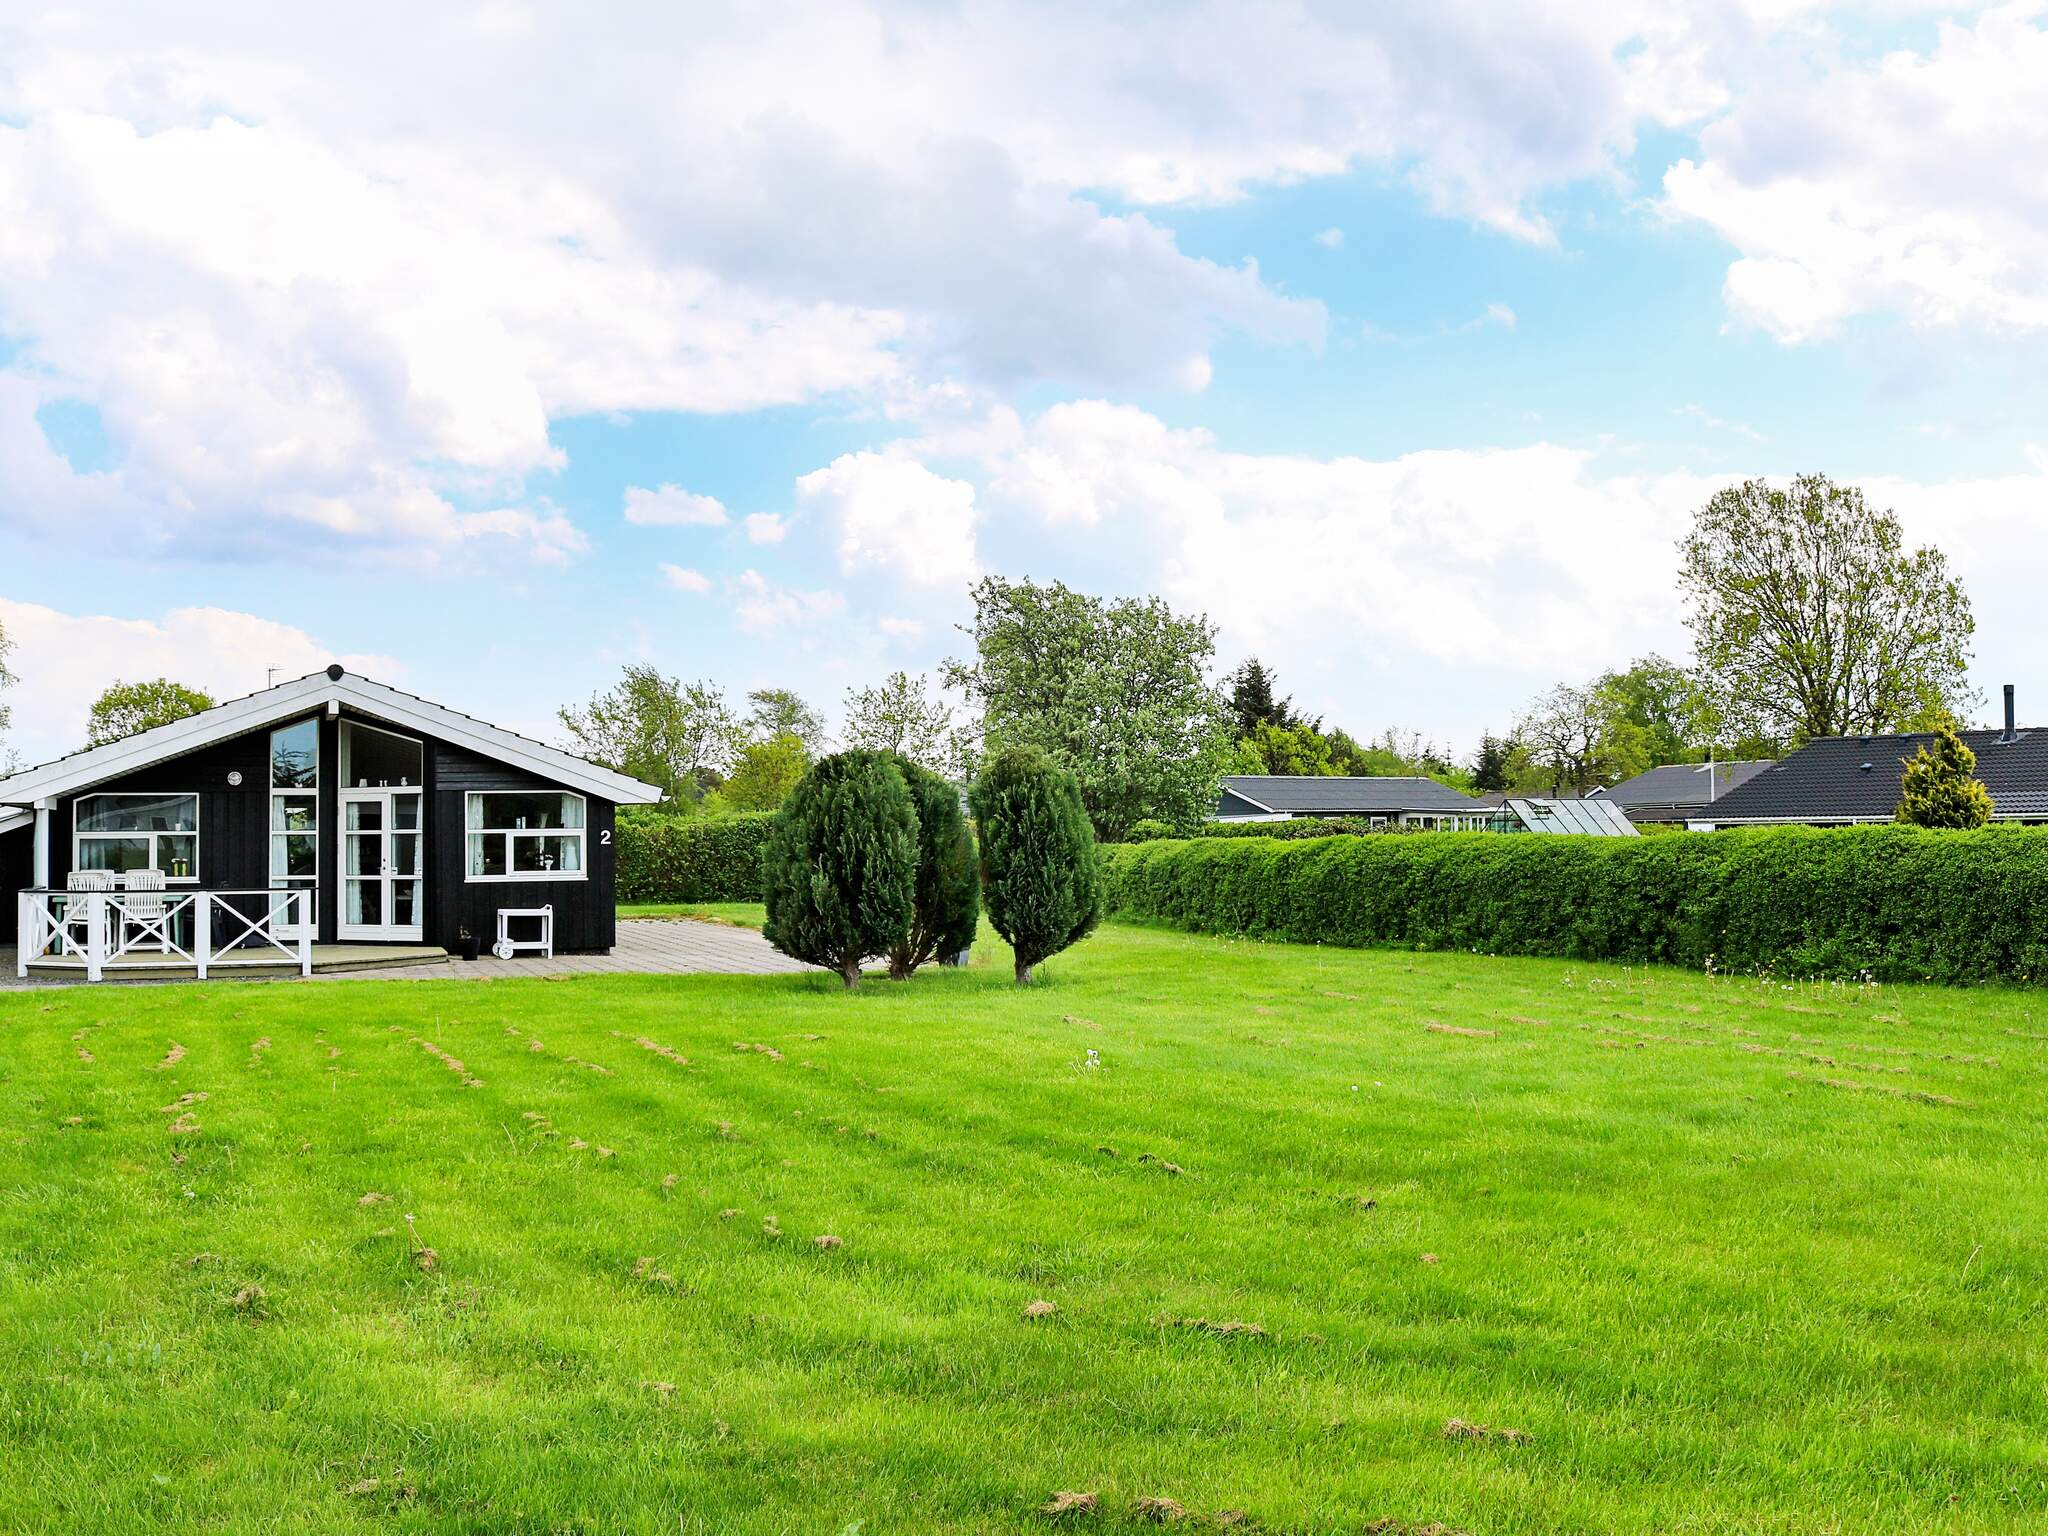 Ferienhaus Øster Hurup (480896), Øster Hurup, , Ostjütland, Dänemark, Bild 1